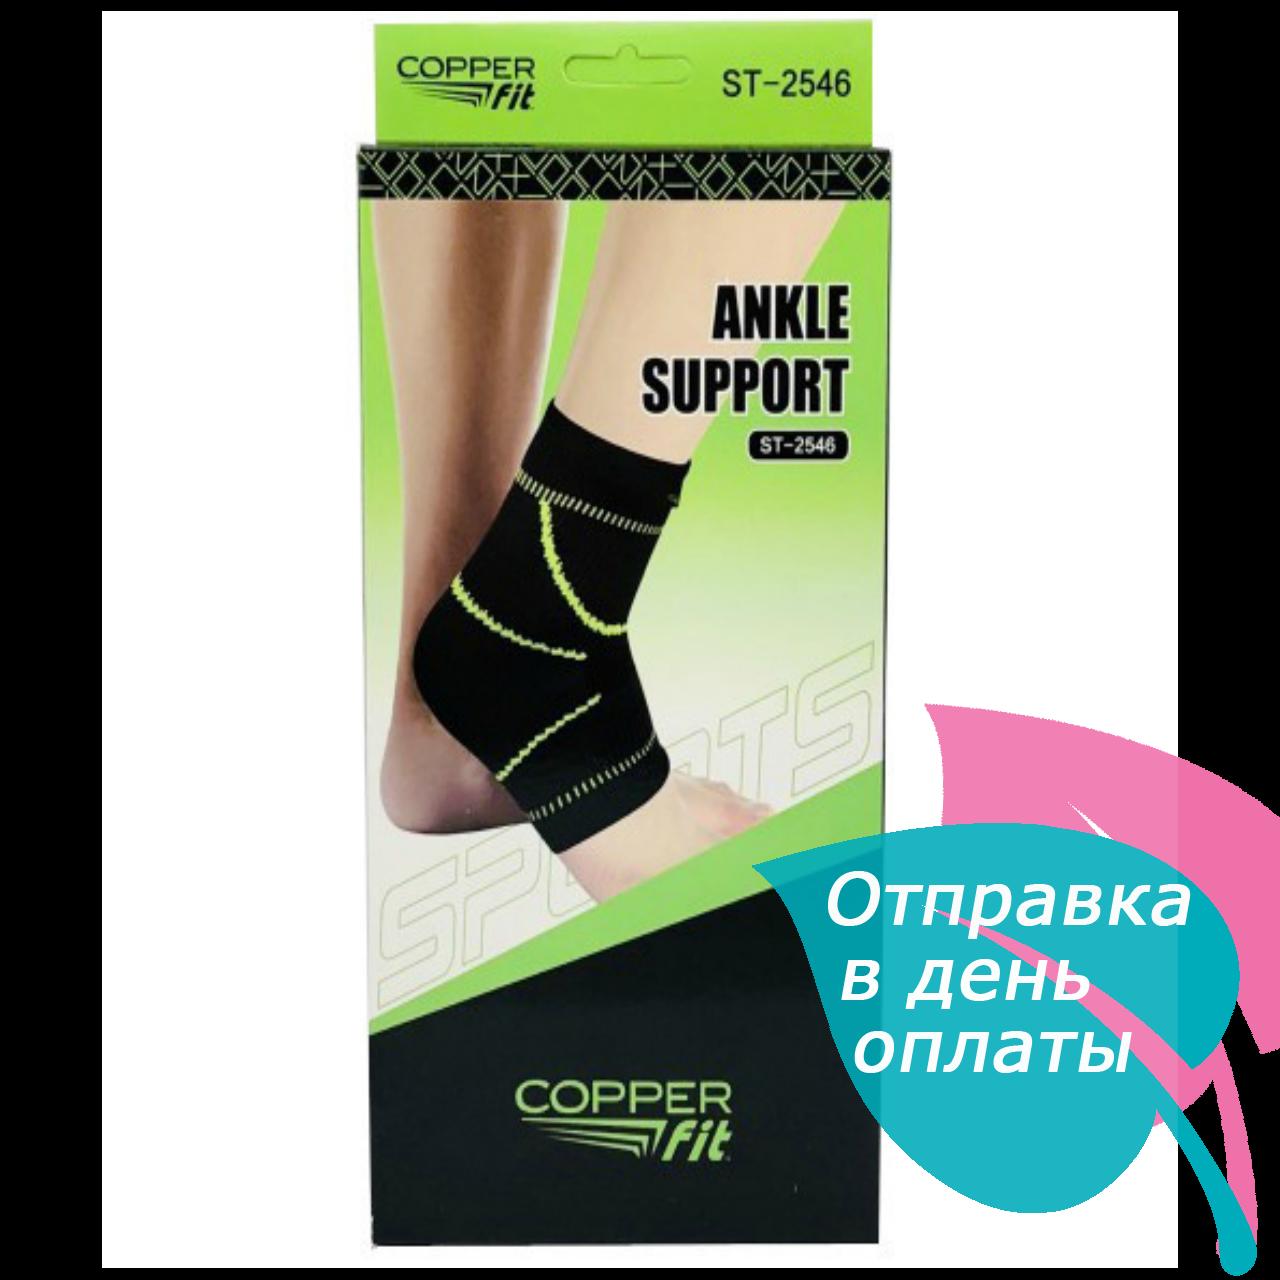 Голеностопный фиксатор Copper Fit Ankle Support